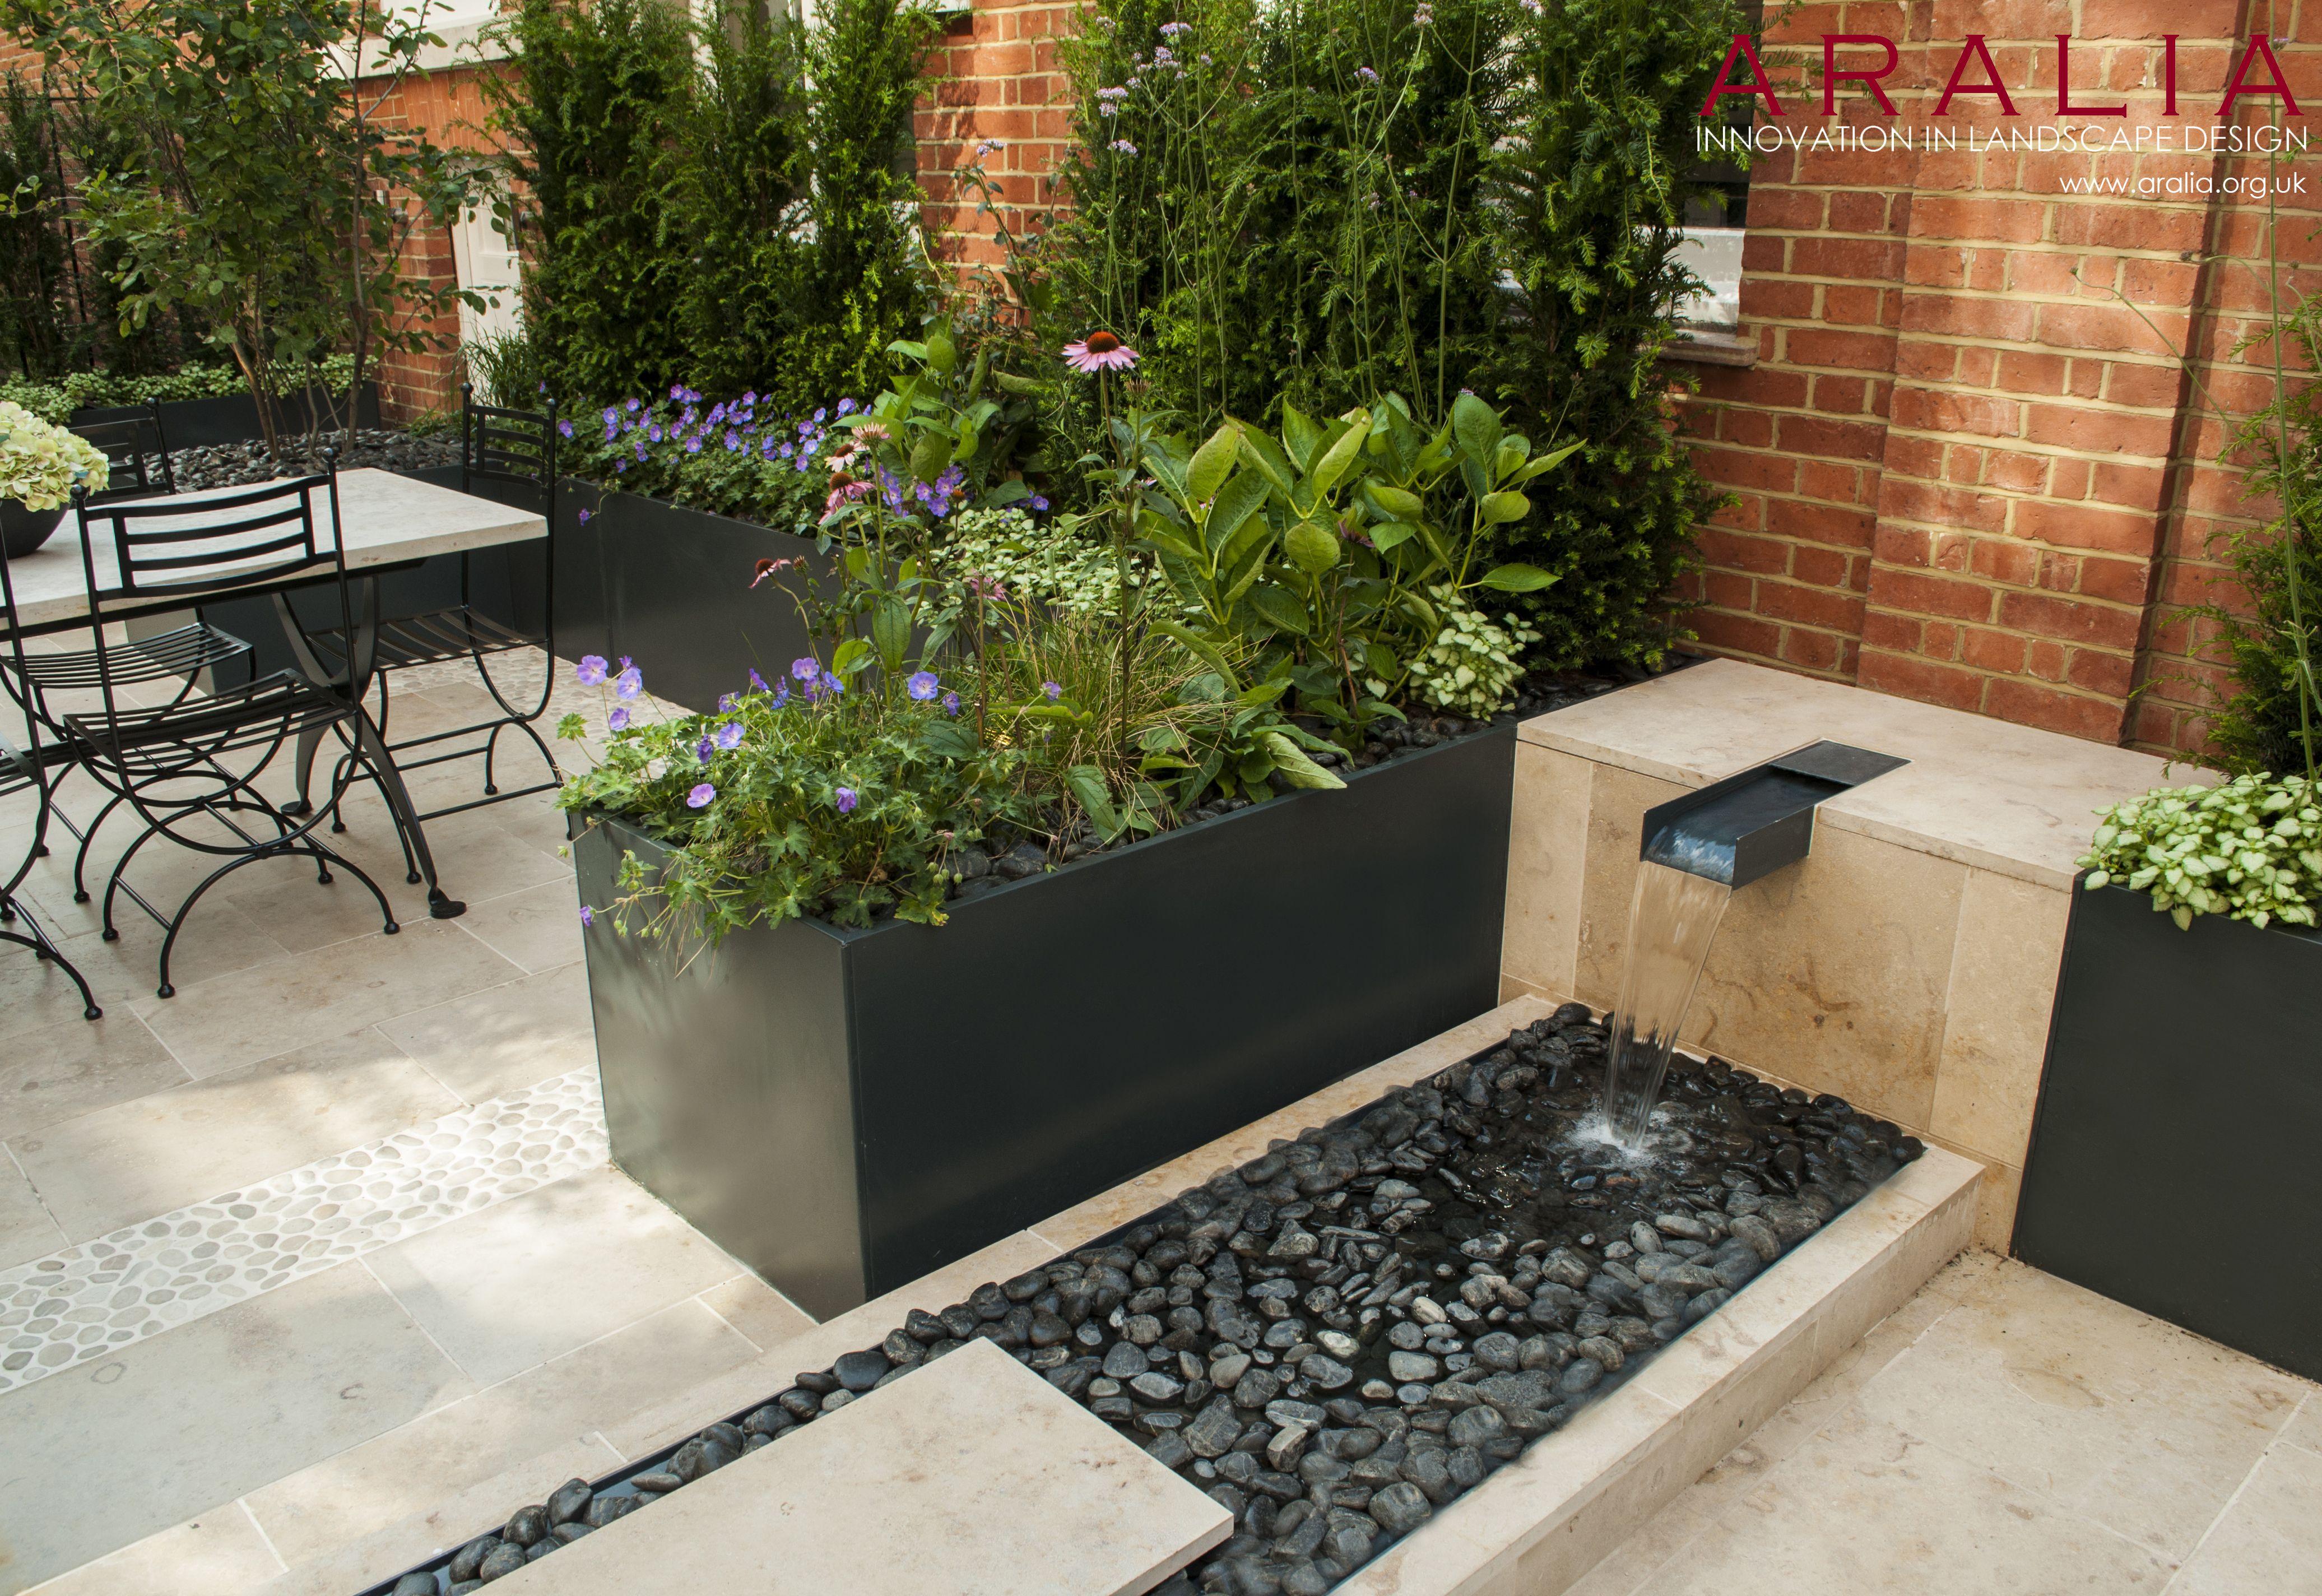 Knightsbridge Roof Terrace Winner Of The New Homes Garden Awards 2014 For Best Roof Te Modern Water Feature Modern Garden Design Water Features In The Garden